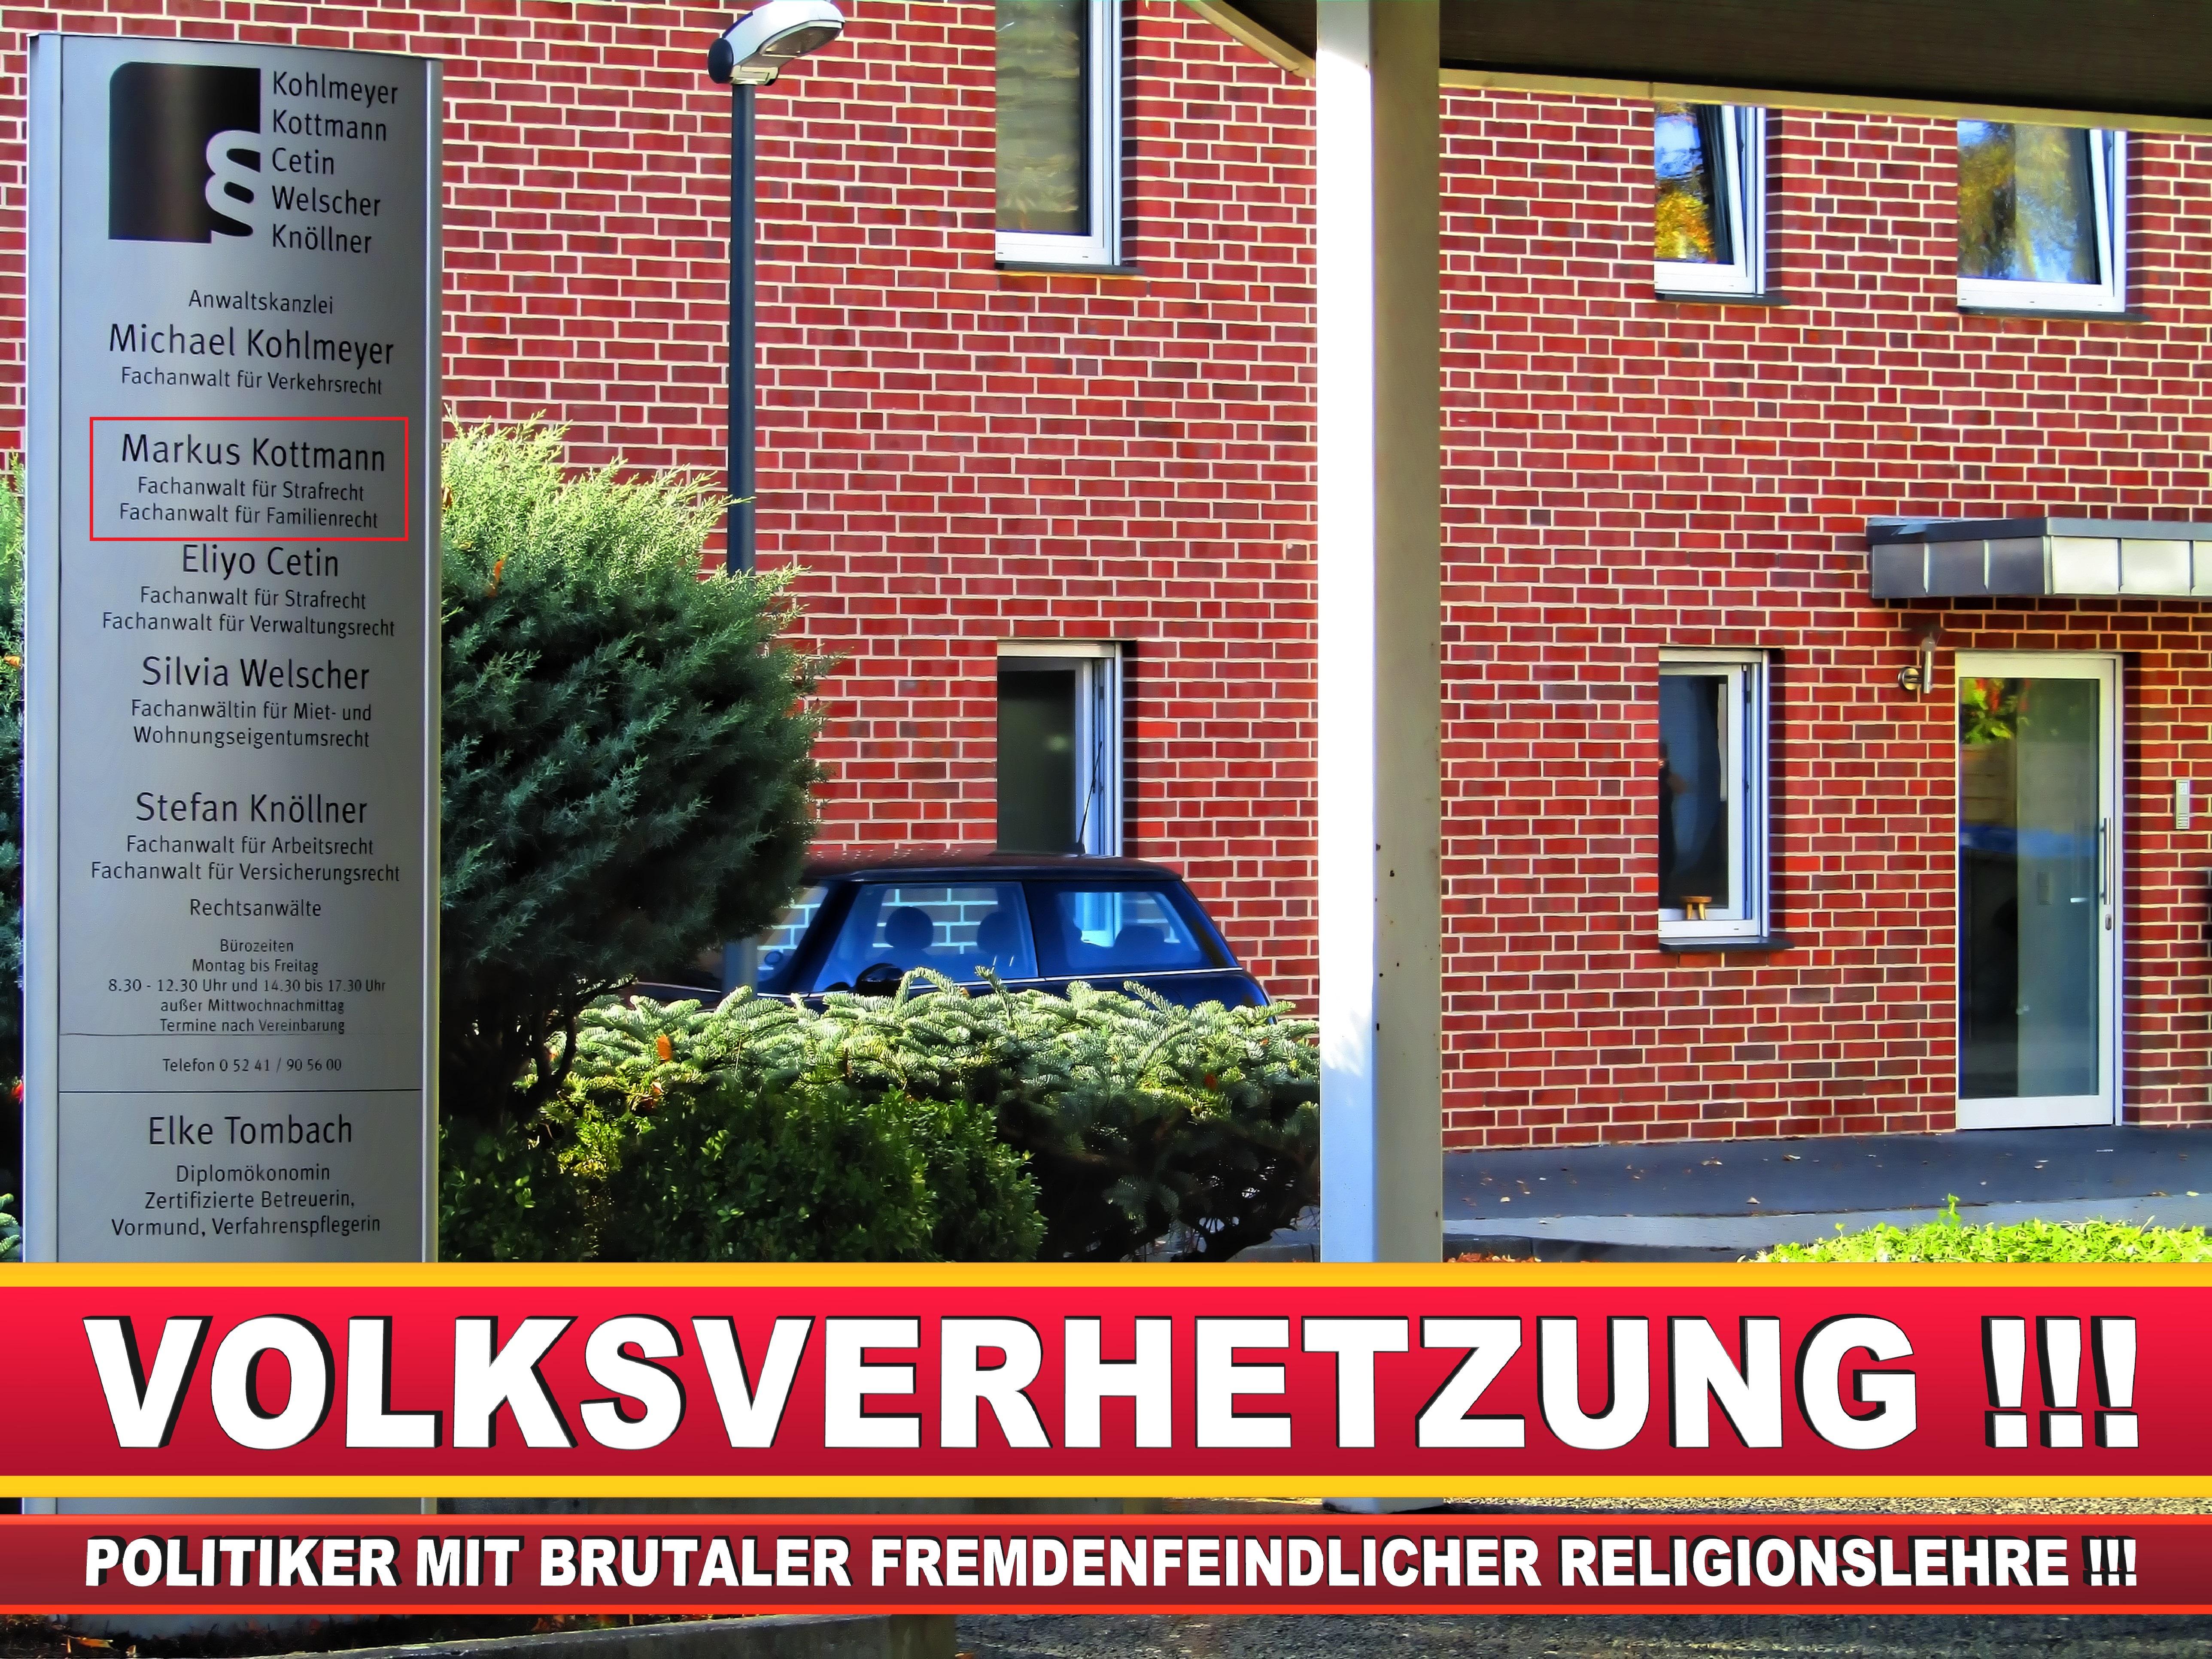 RECHTSANWÄLTE KOHLMEYER KOTTMANN CETIN WELSCHER KNÖLLNER RECHTSANWALT GÜTERSLOH GT (3) LANDTAGSWAHL BUNDESTAGSWAHL BÜRGERMEISTERWAHL